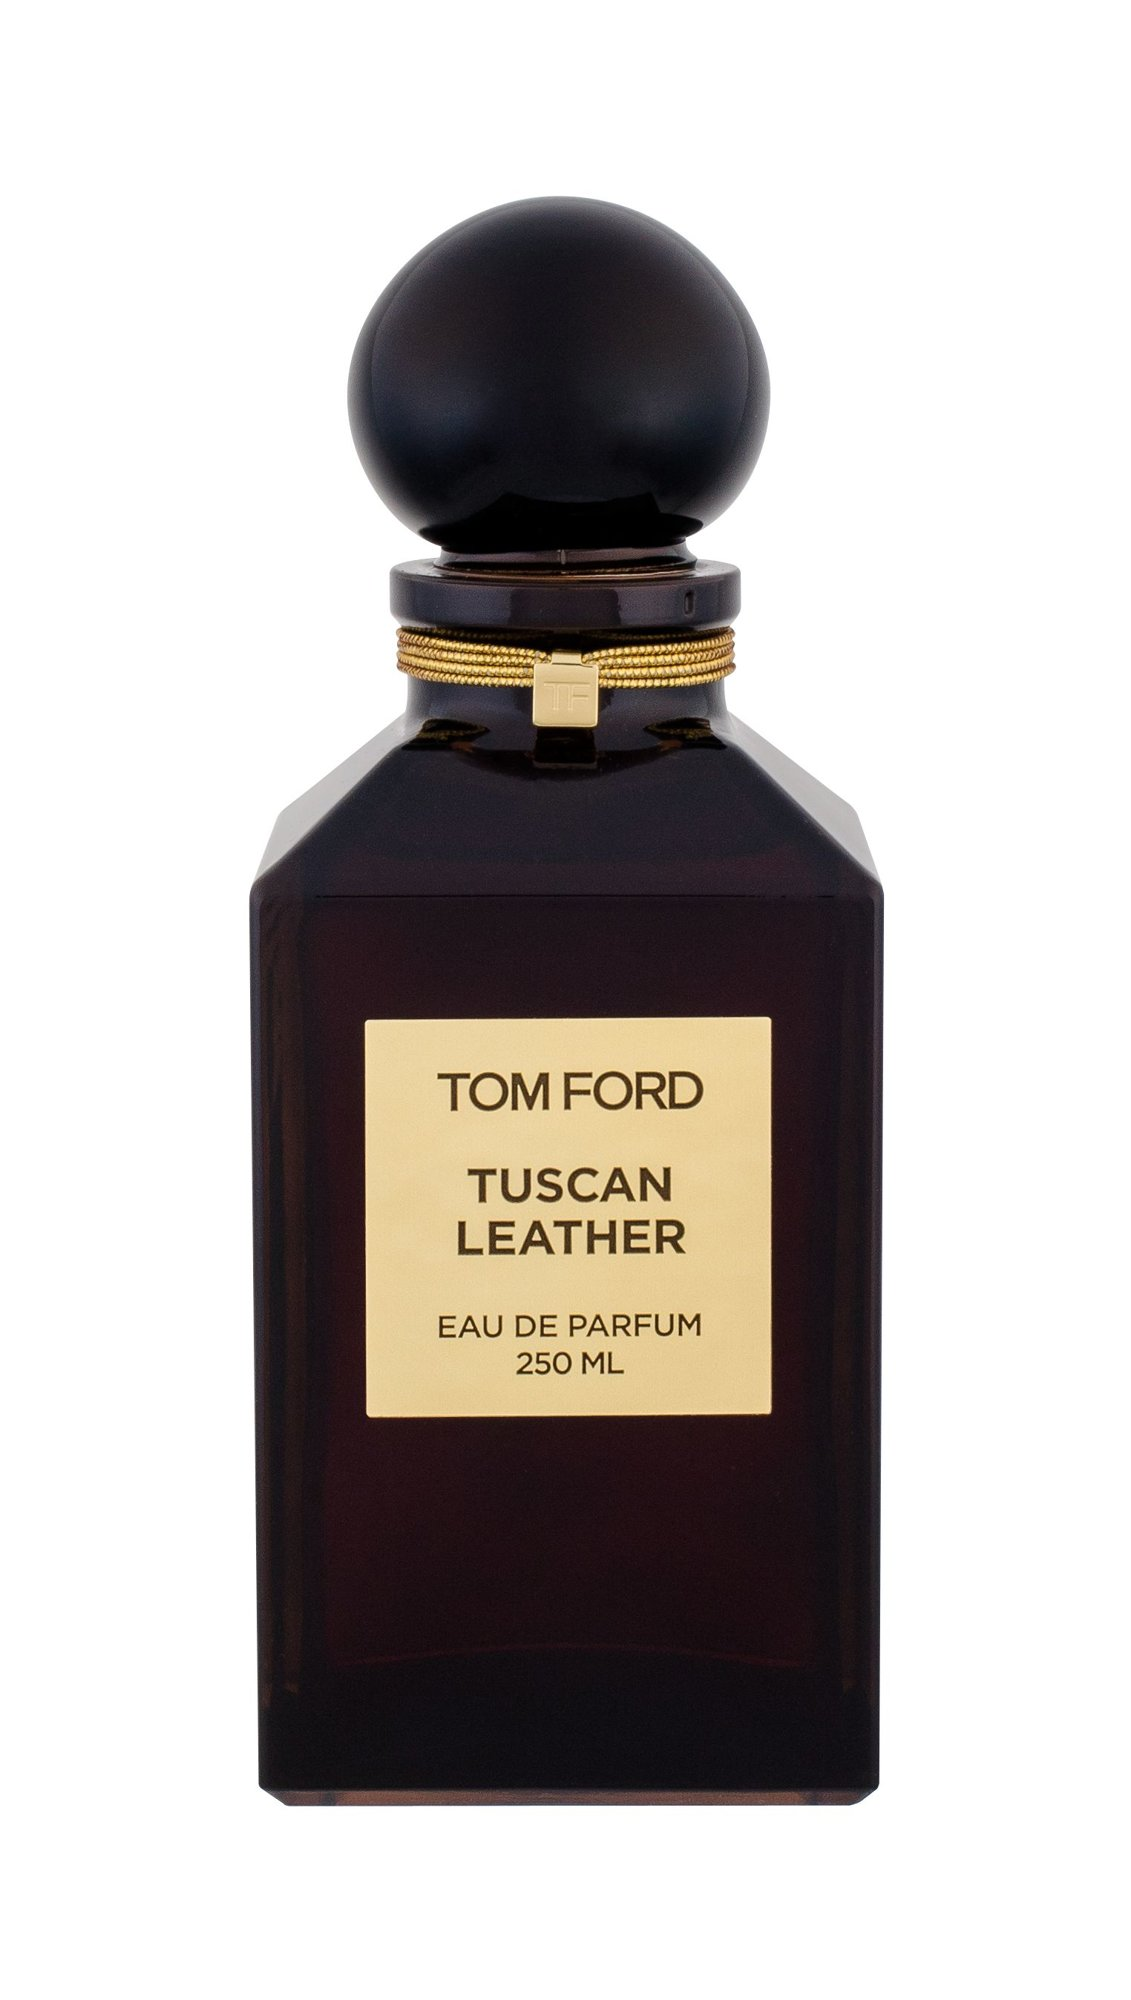 TOM FORD Tuscan Leather Eau de Parfum 250ml